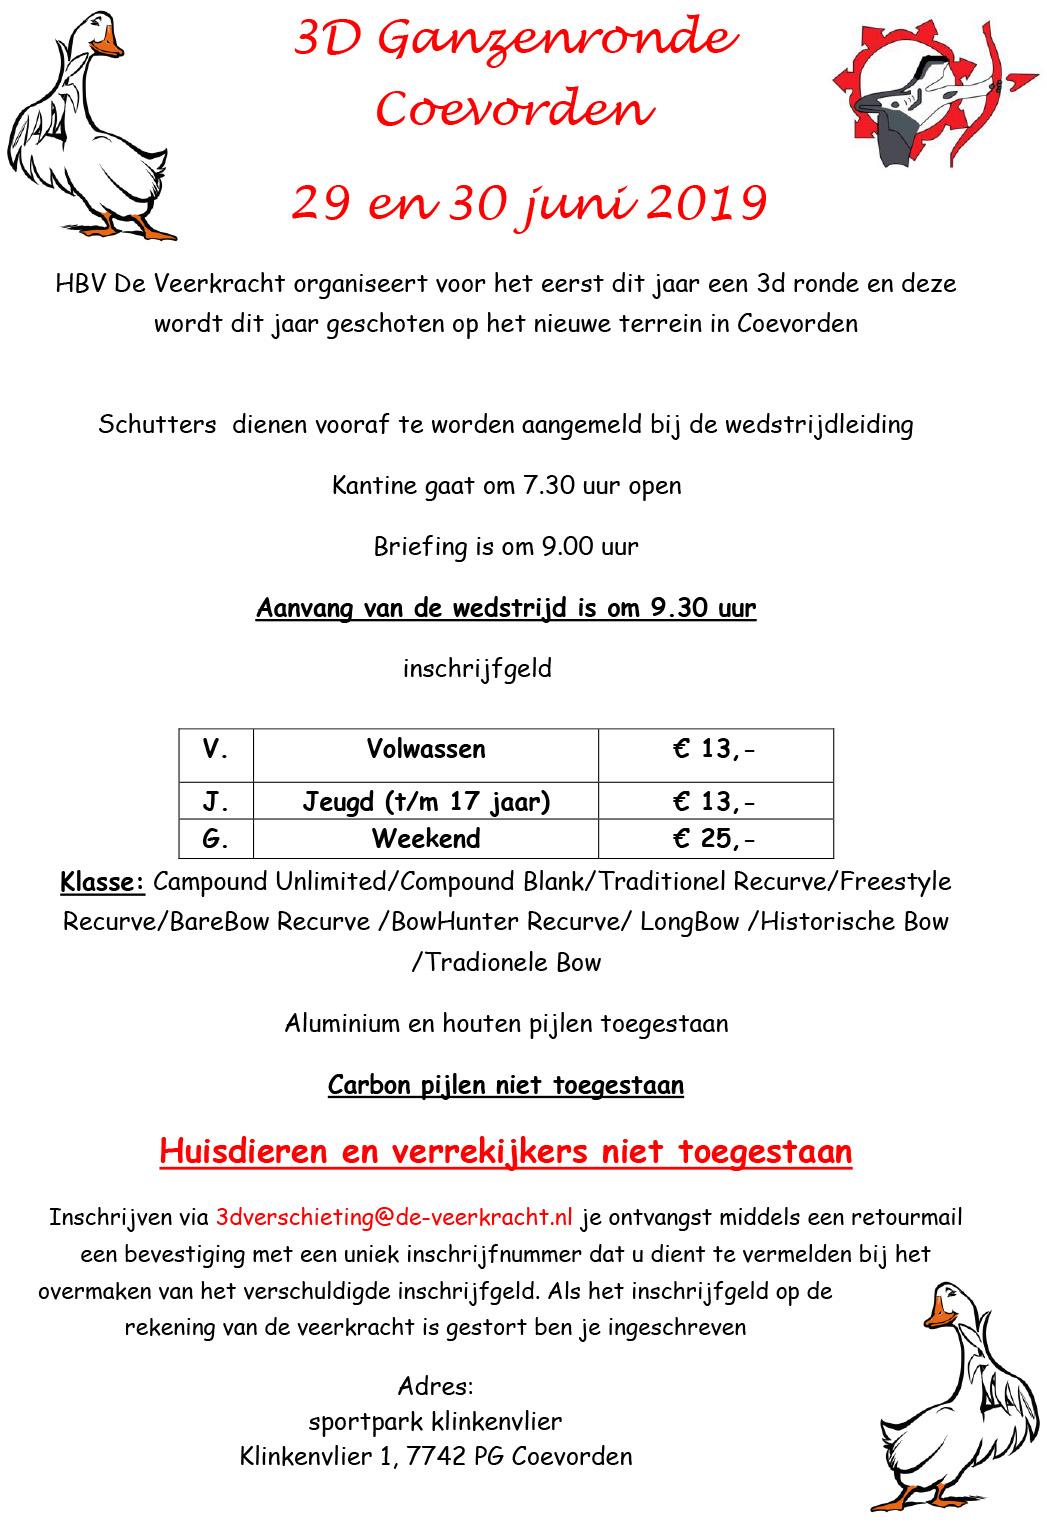 Uitnodiging 3D Ganzenronde Coevorden 2019